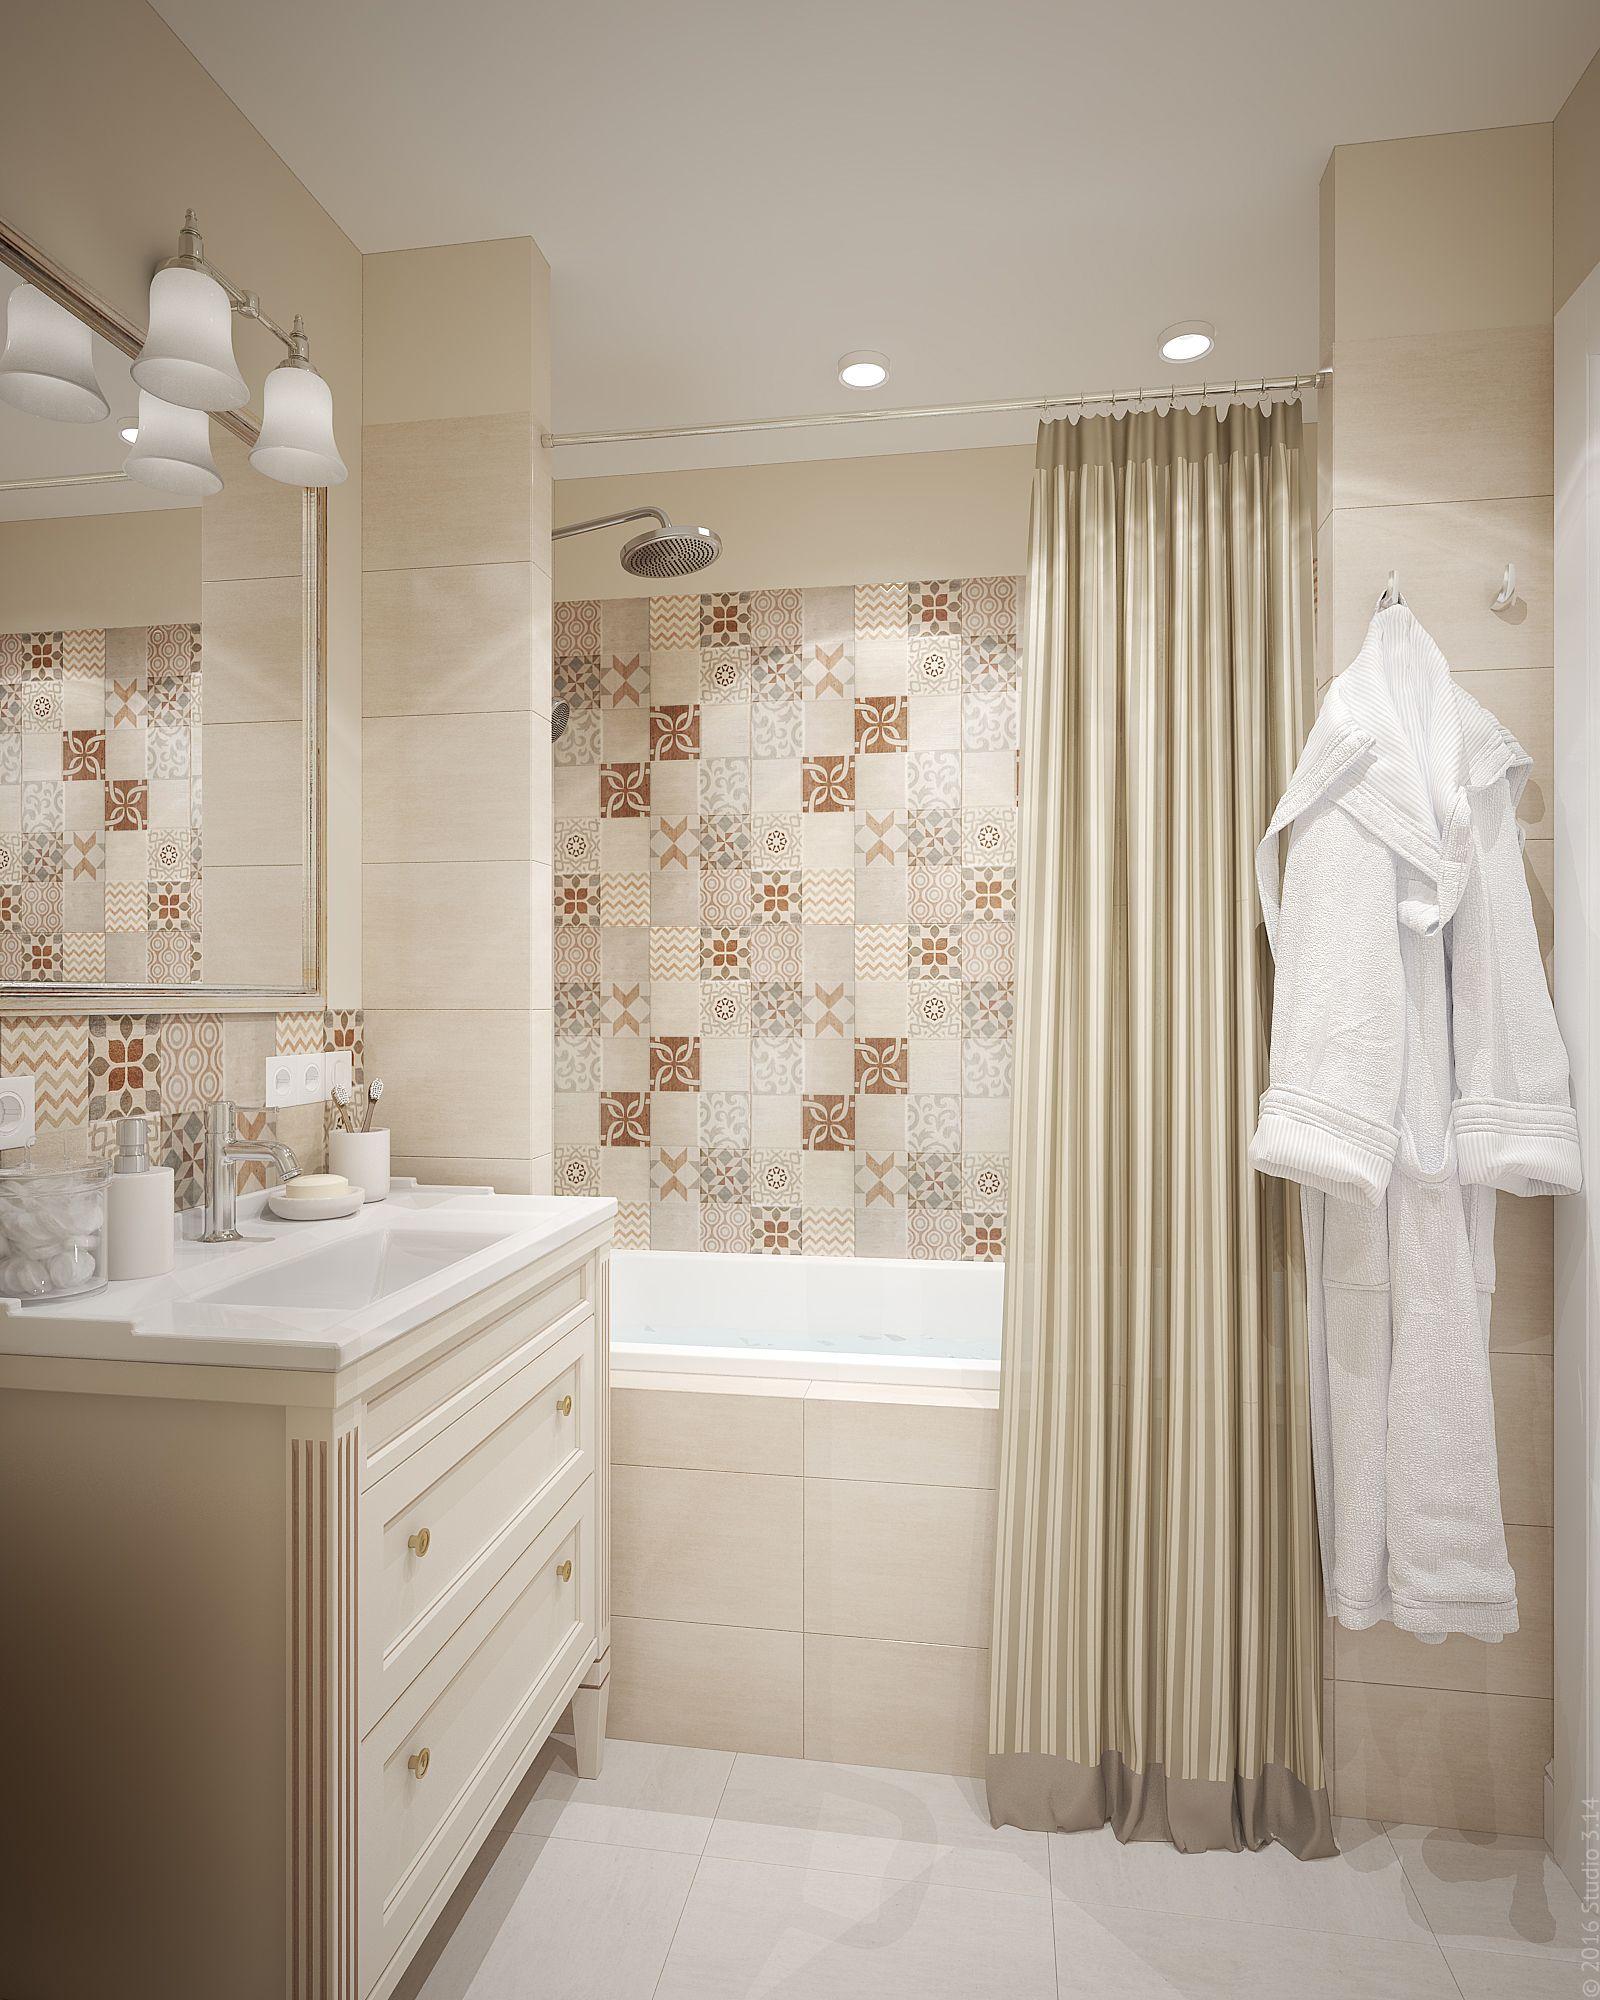 интерьер ванной комнаты фото 10